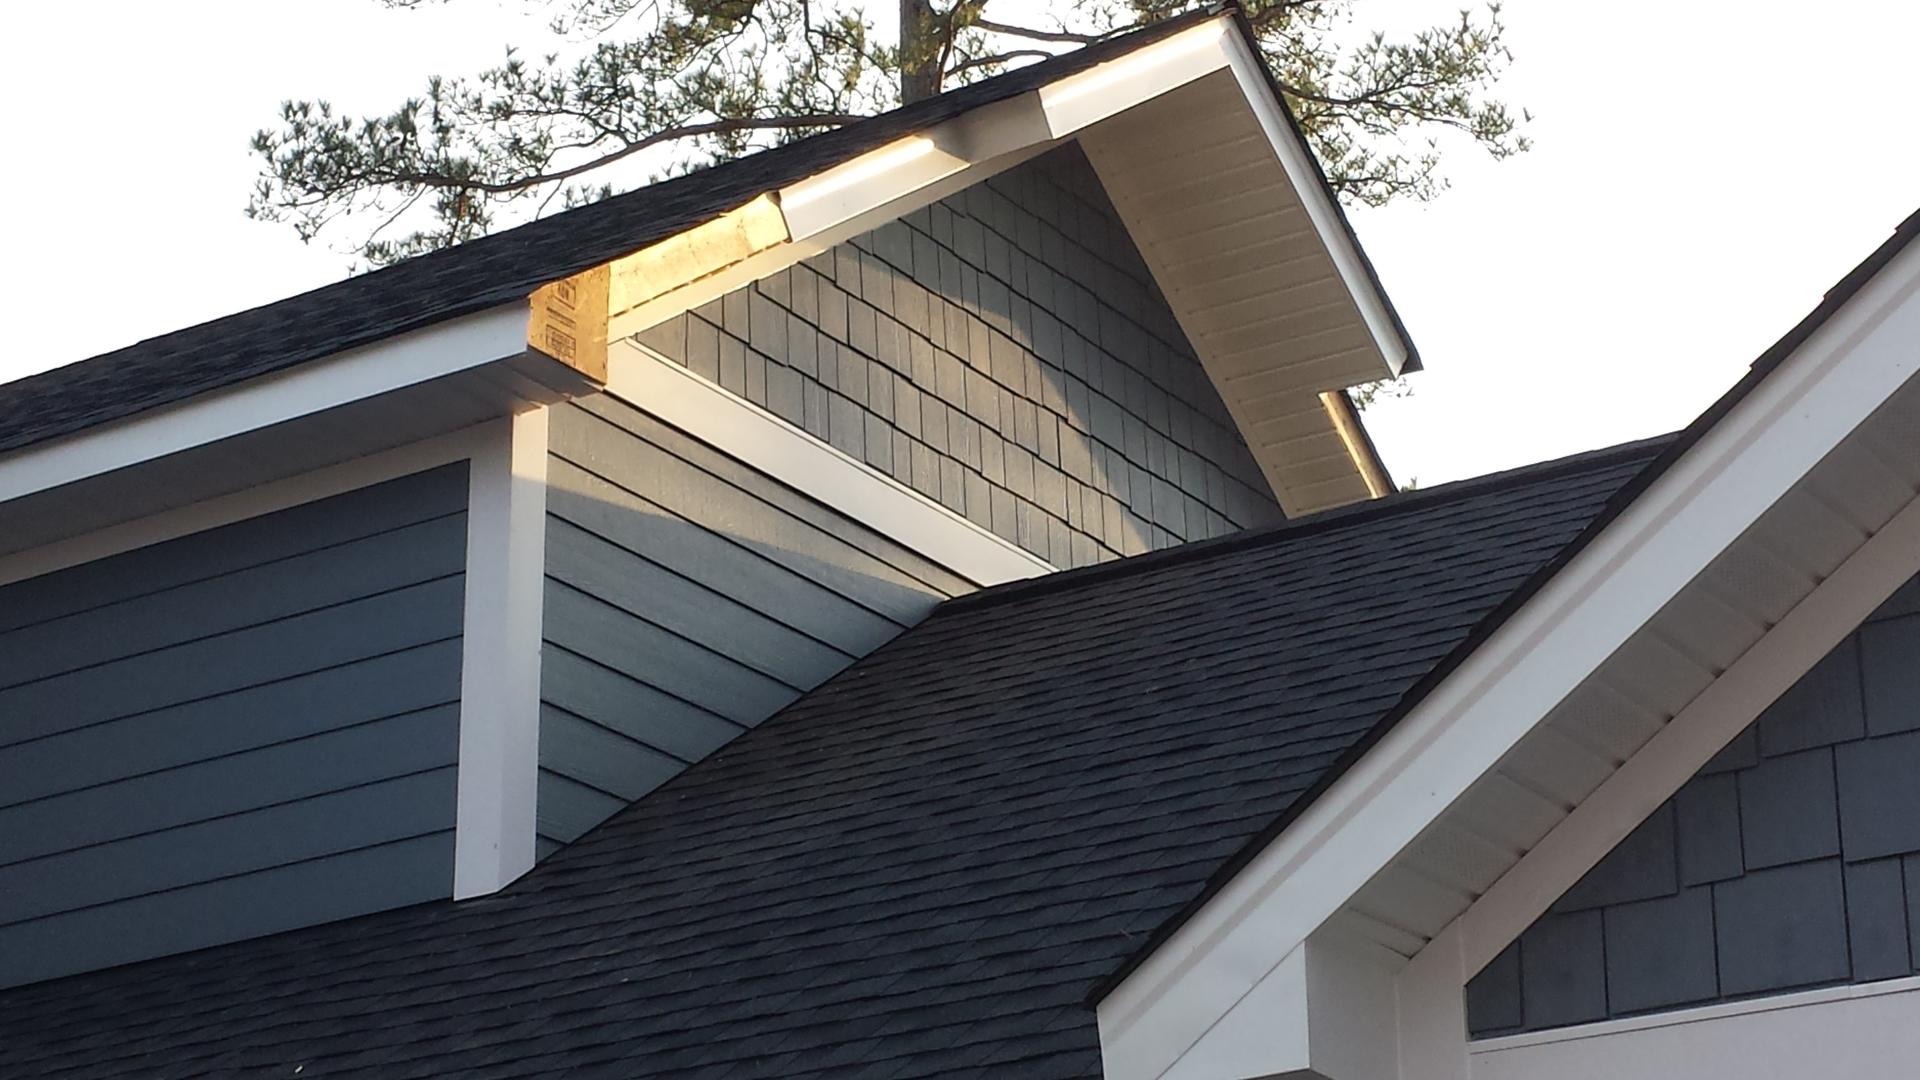 Roofing Contractor Roof Repair Midlothian Va George